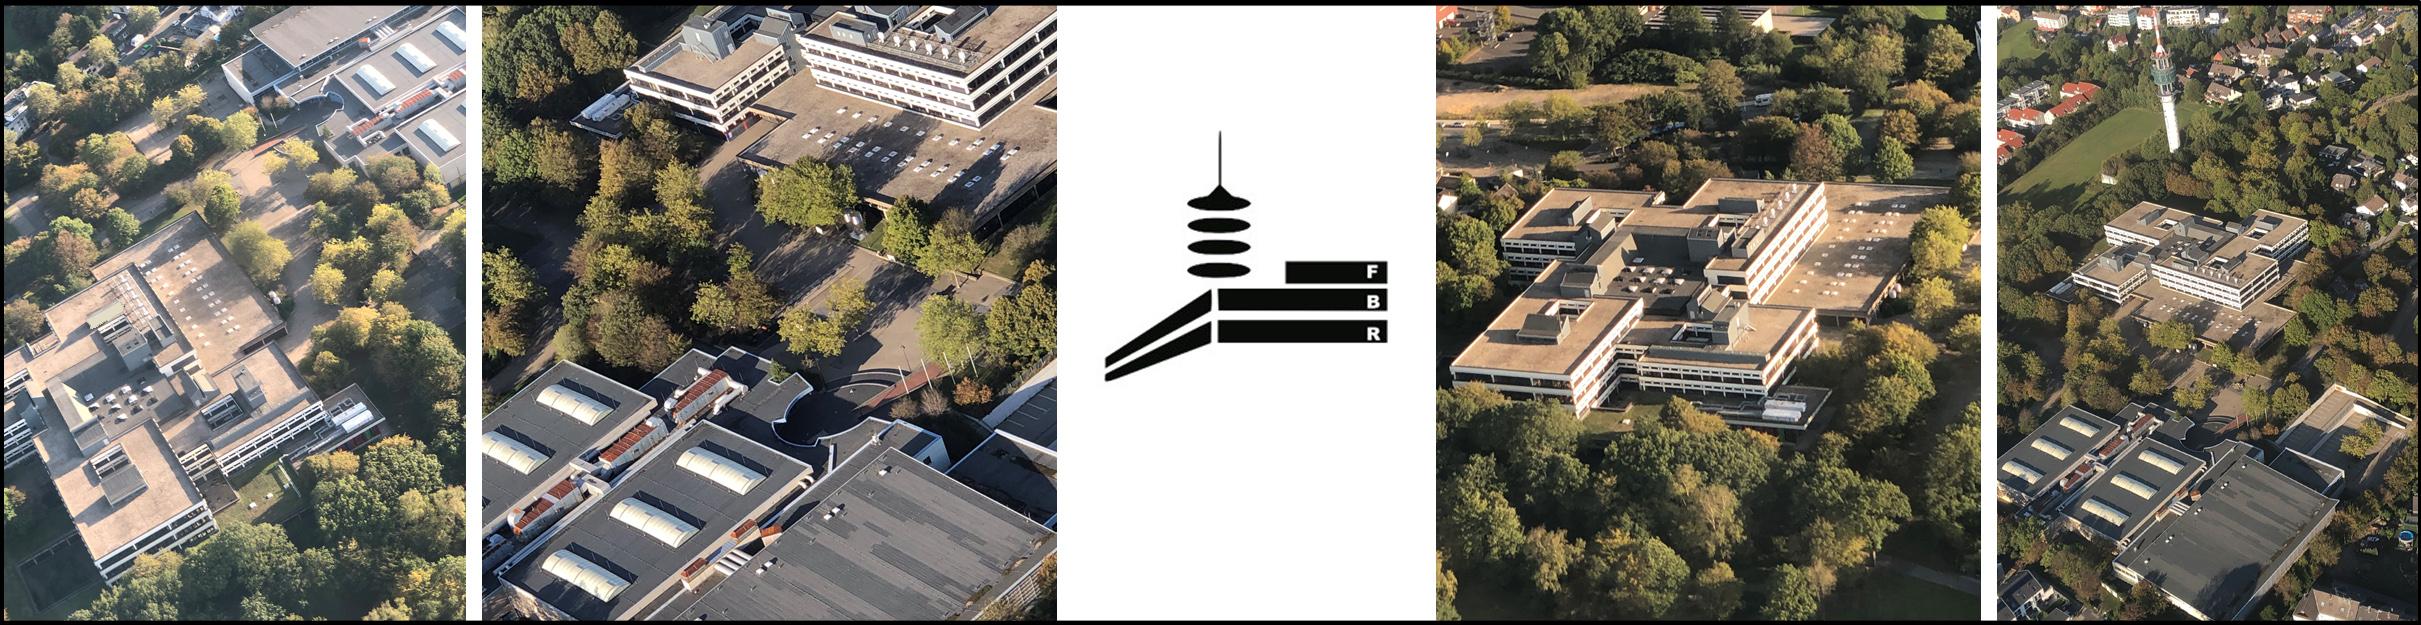 Friedrich-Bayer-Realschule Wuppertal – NRW Sportschule